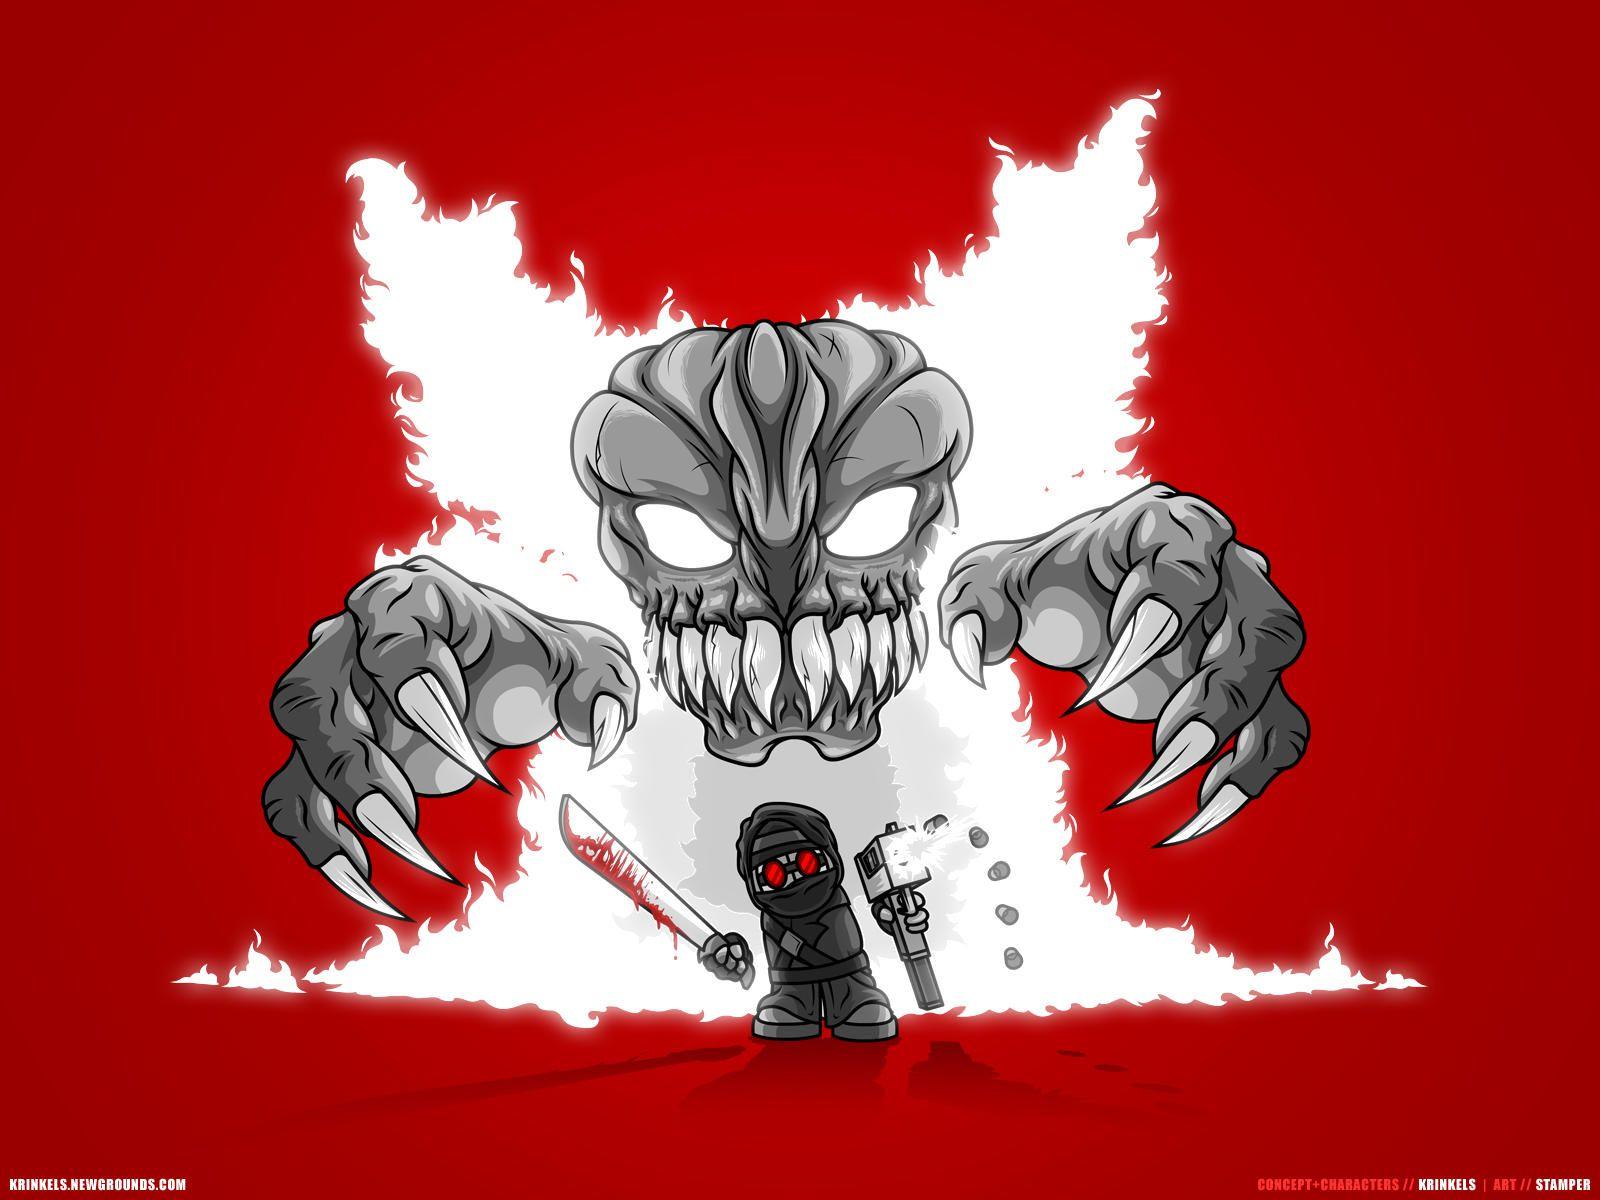 Tricky Looms Over Hank Madness Combat Combat Art Robot Concept Art Combat Fan